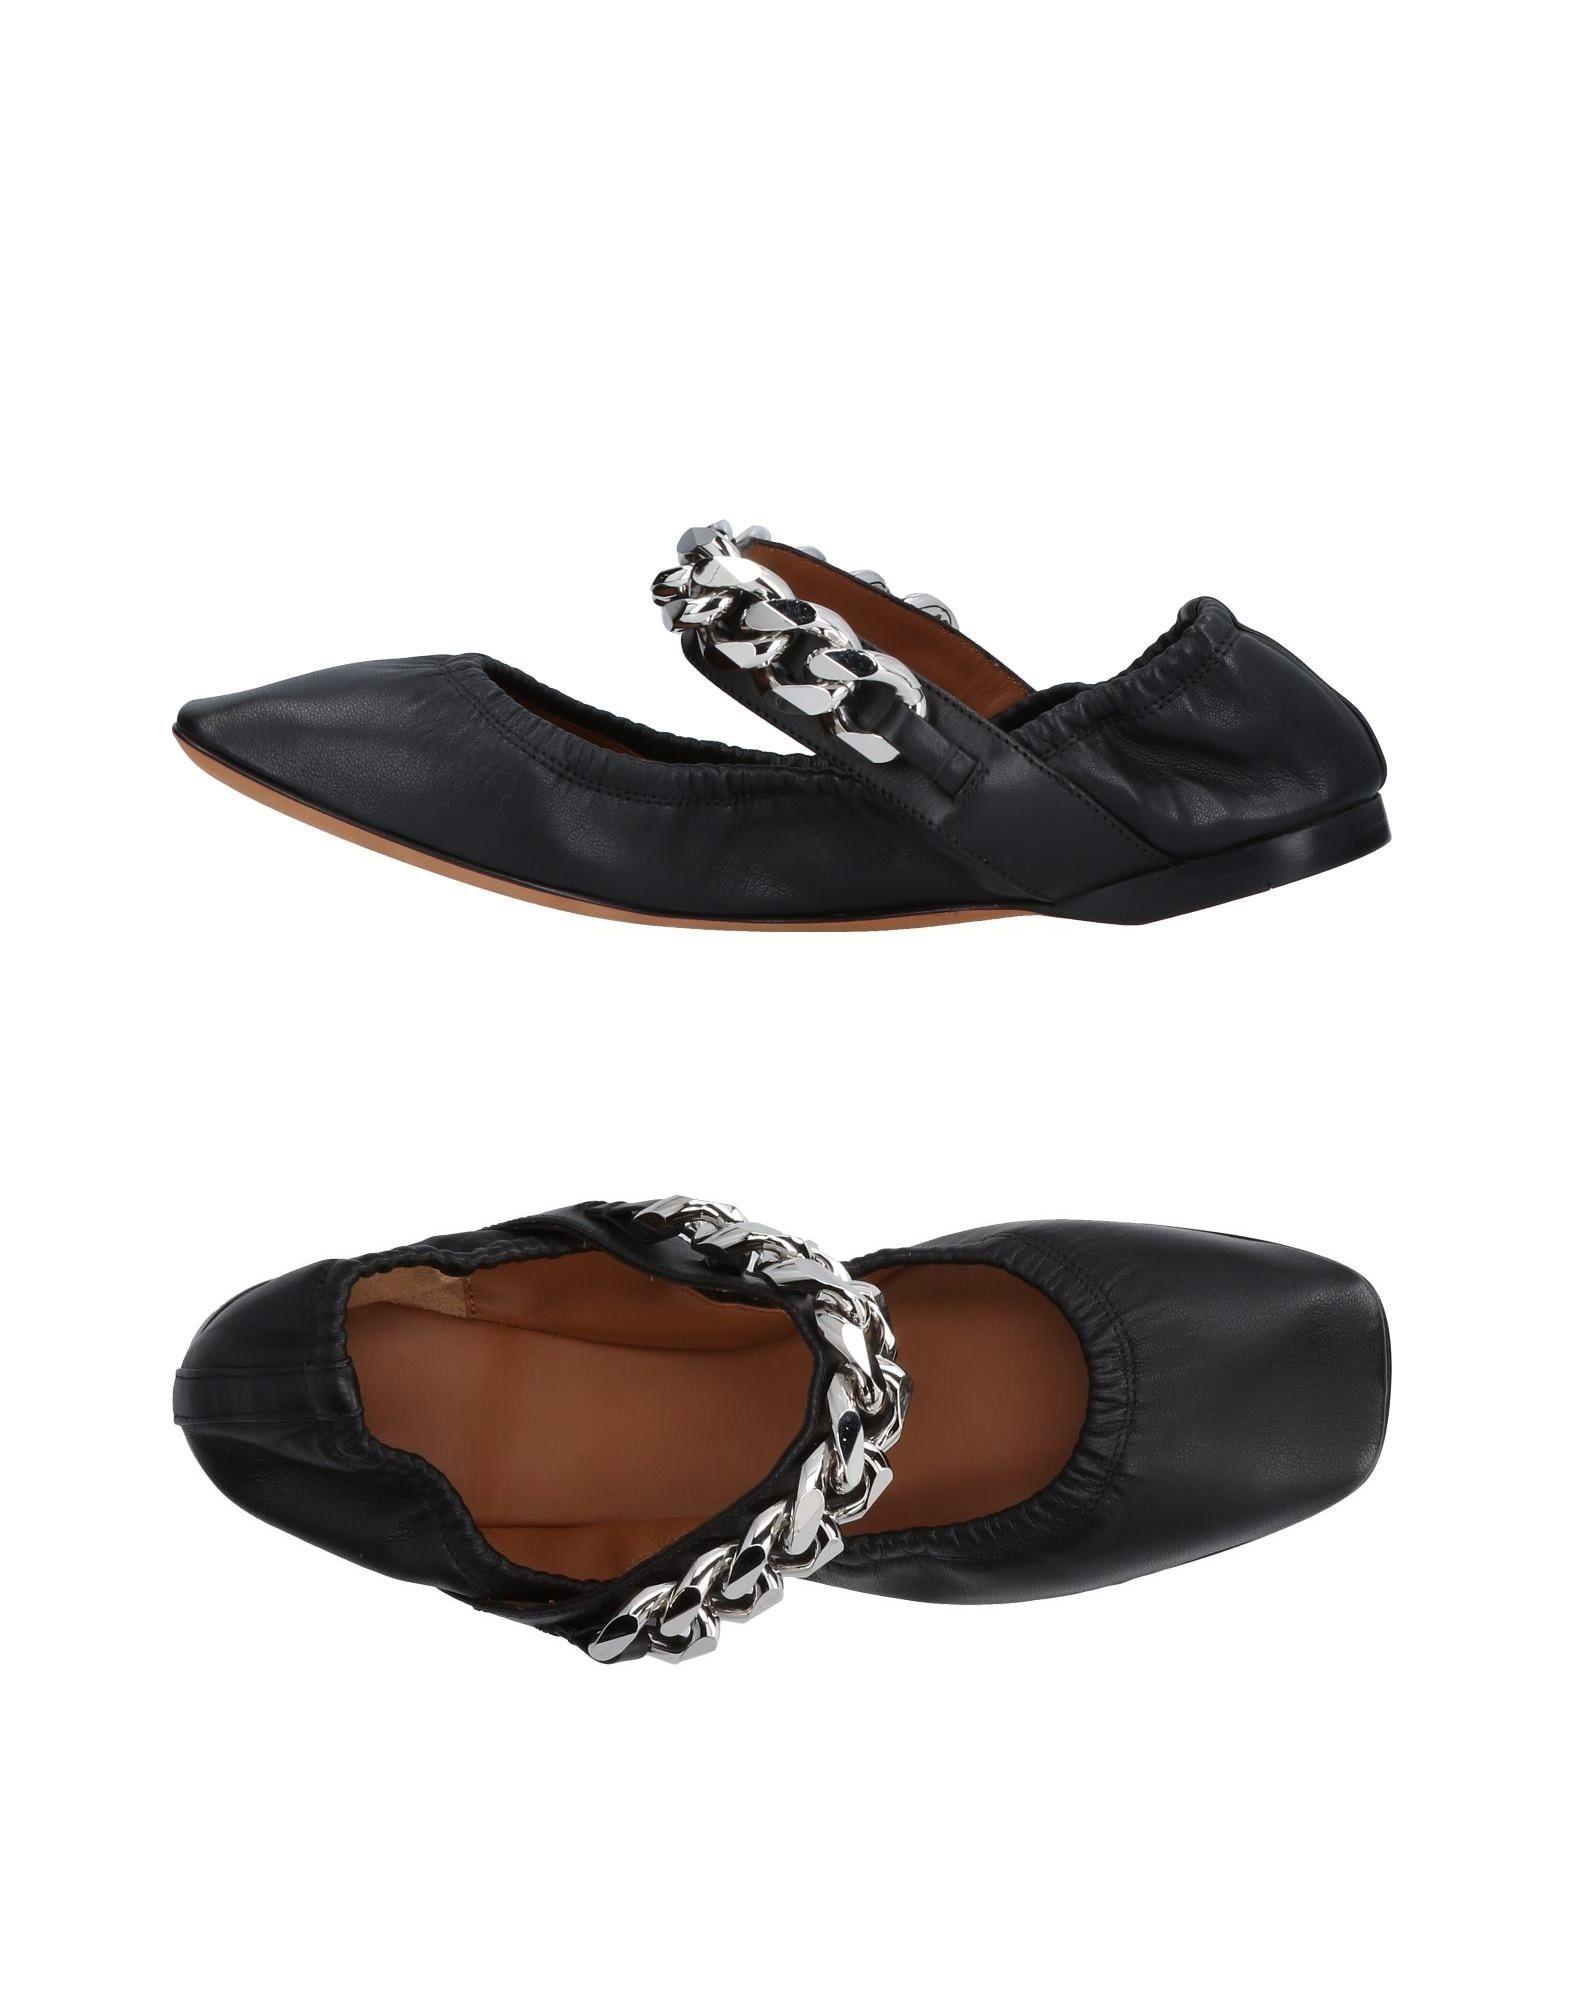 d10f6b0d4 Givenchy балетки купить - цена на Inbio-Shop